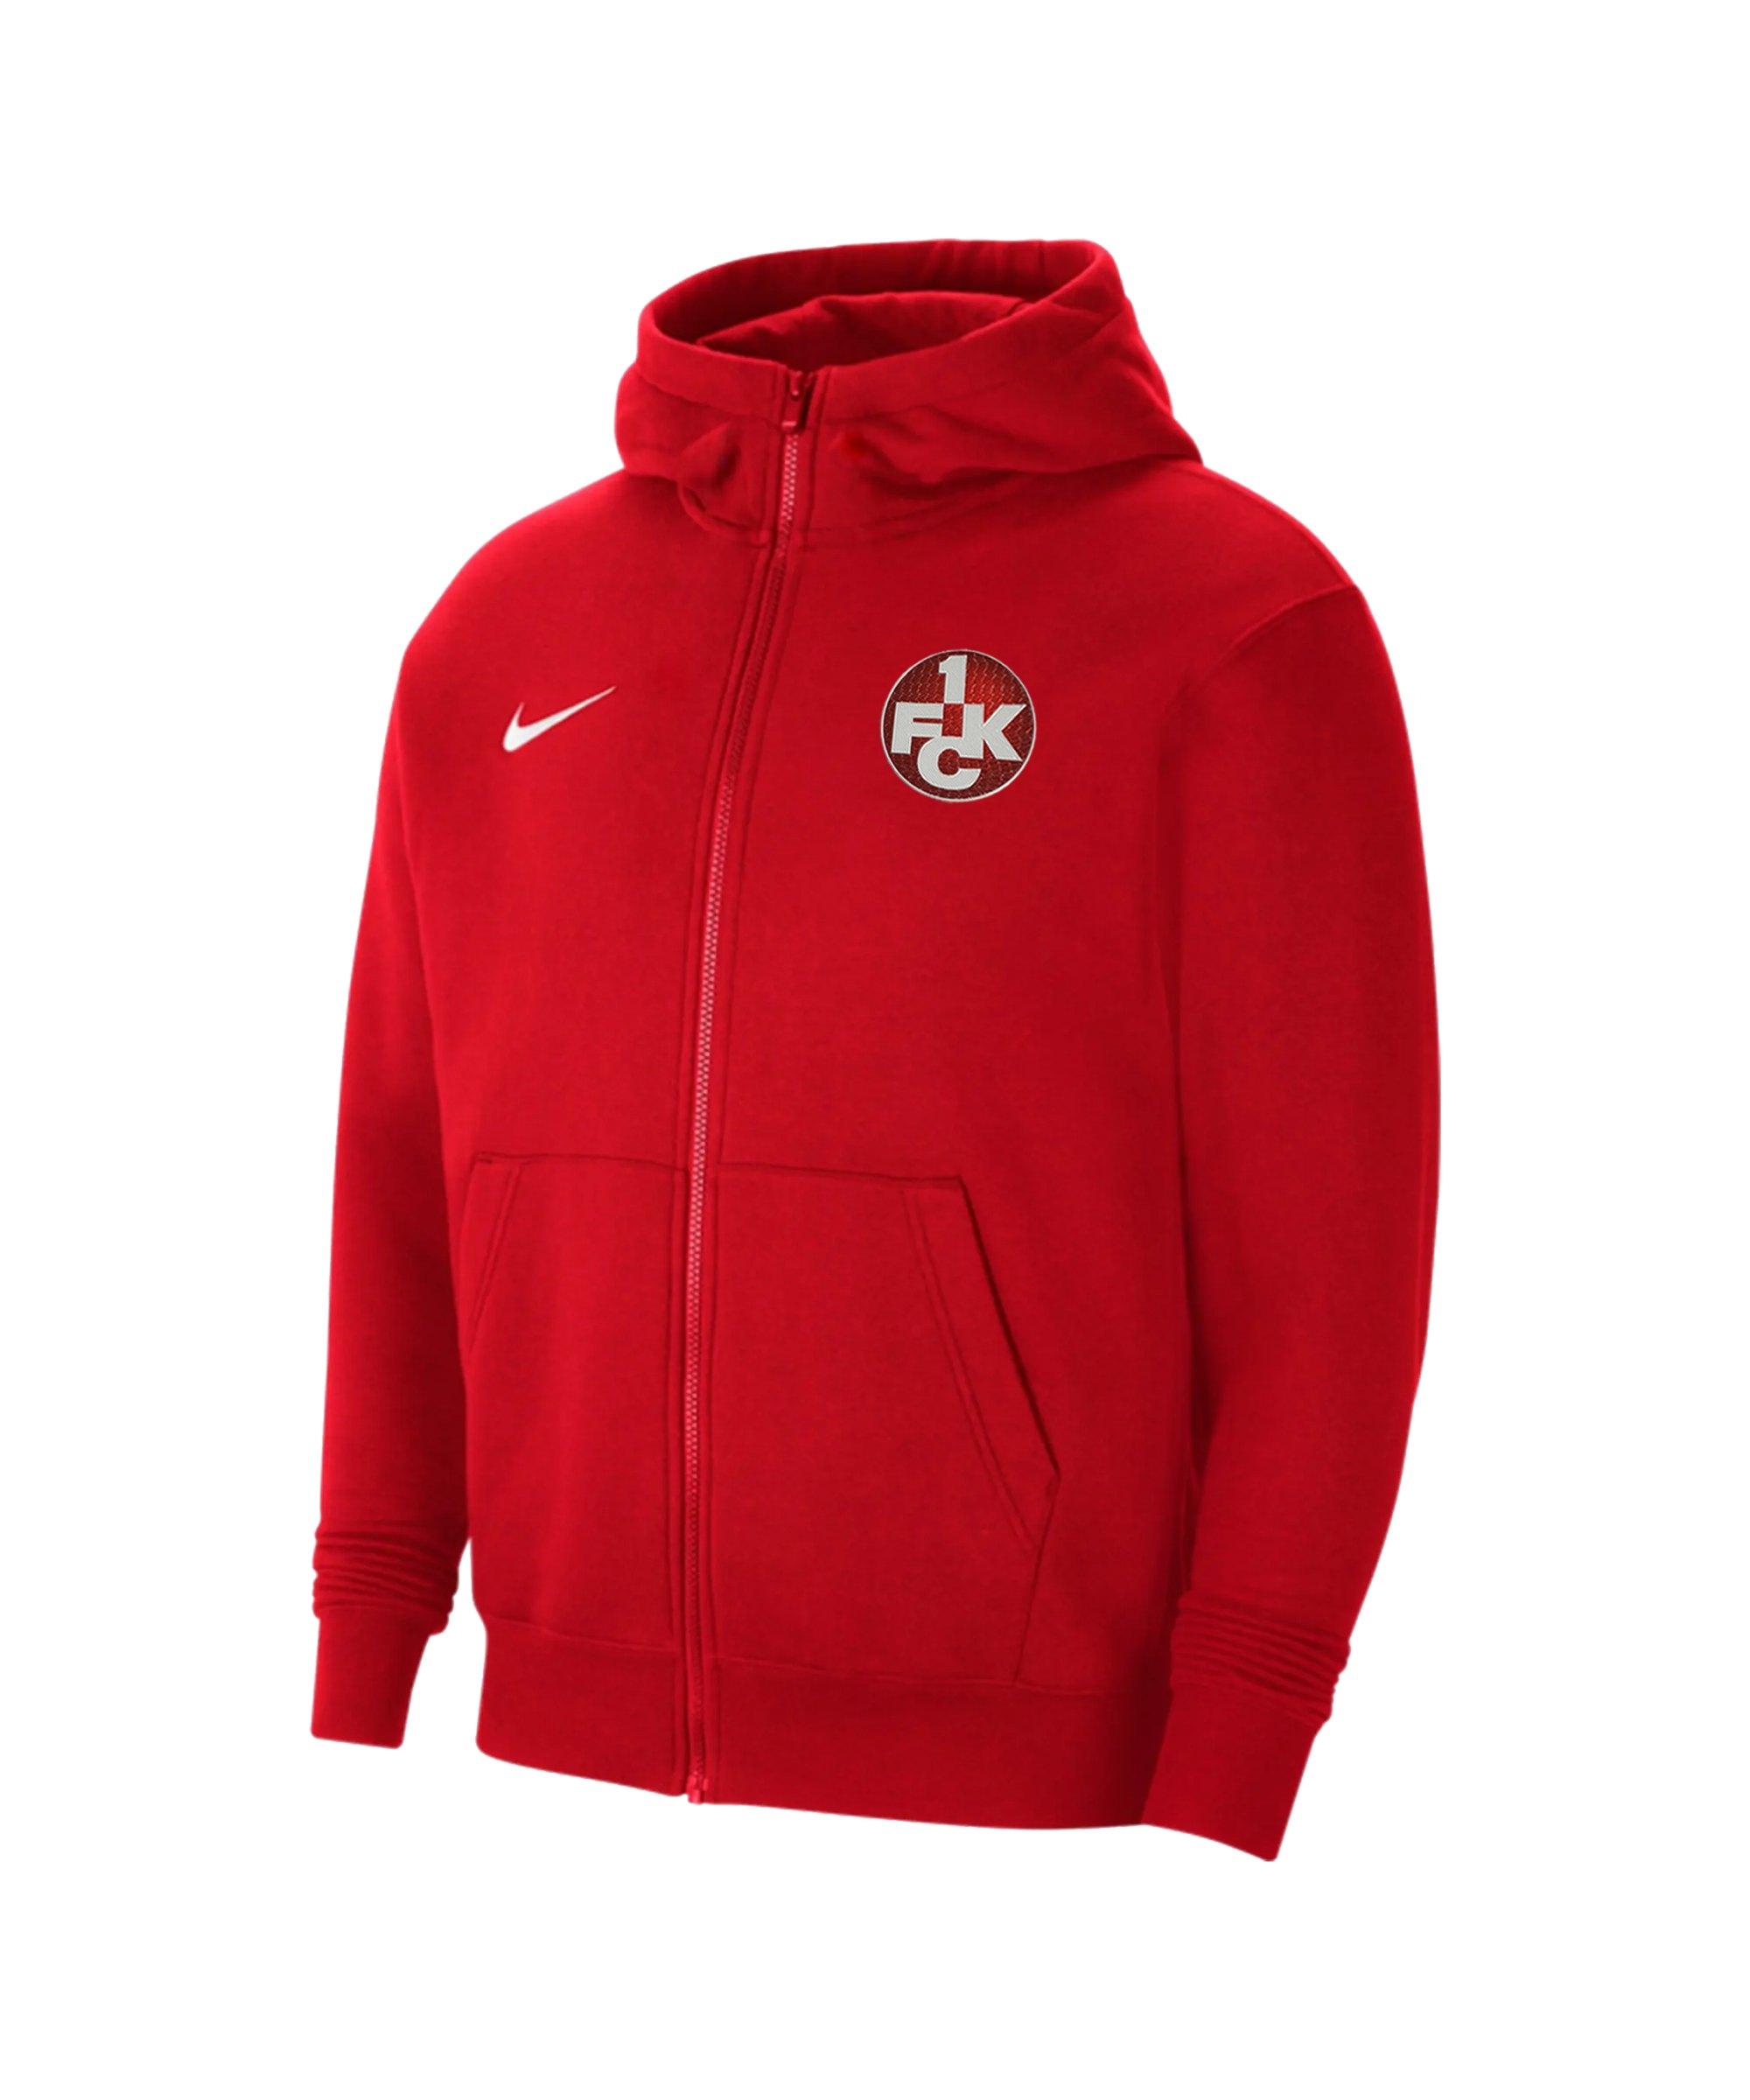 Nike 1. FC Kaiserslautern Kapuzenjacke Kids Rot F657 - rot